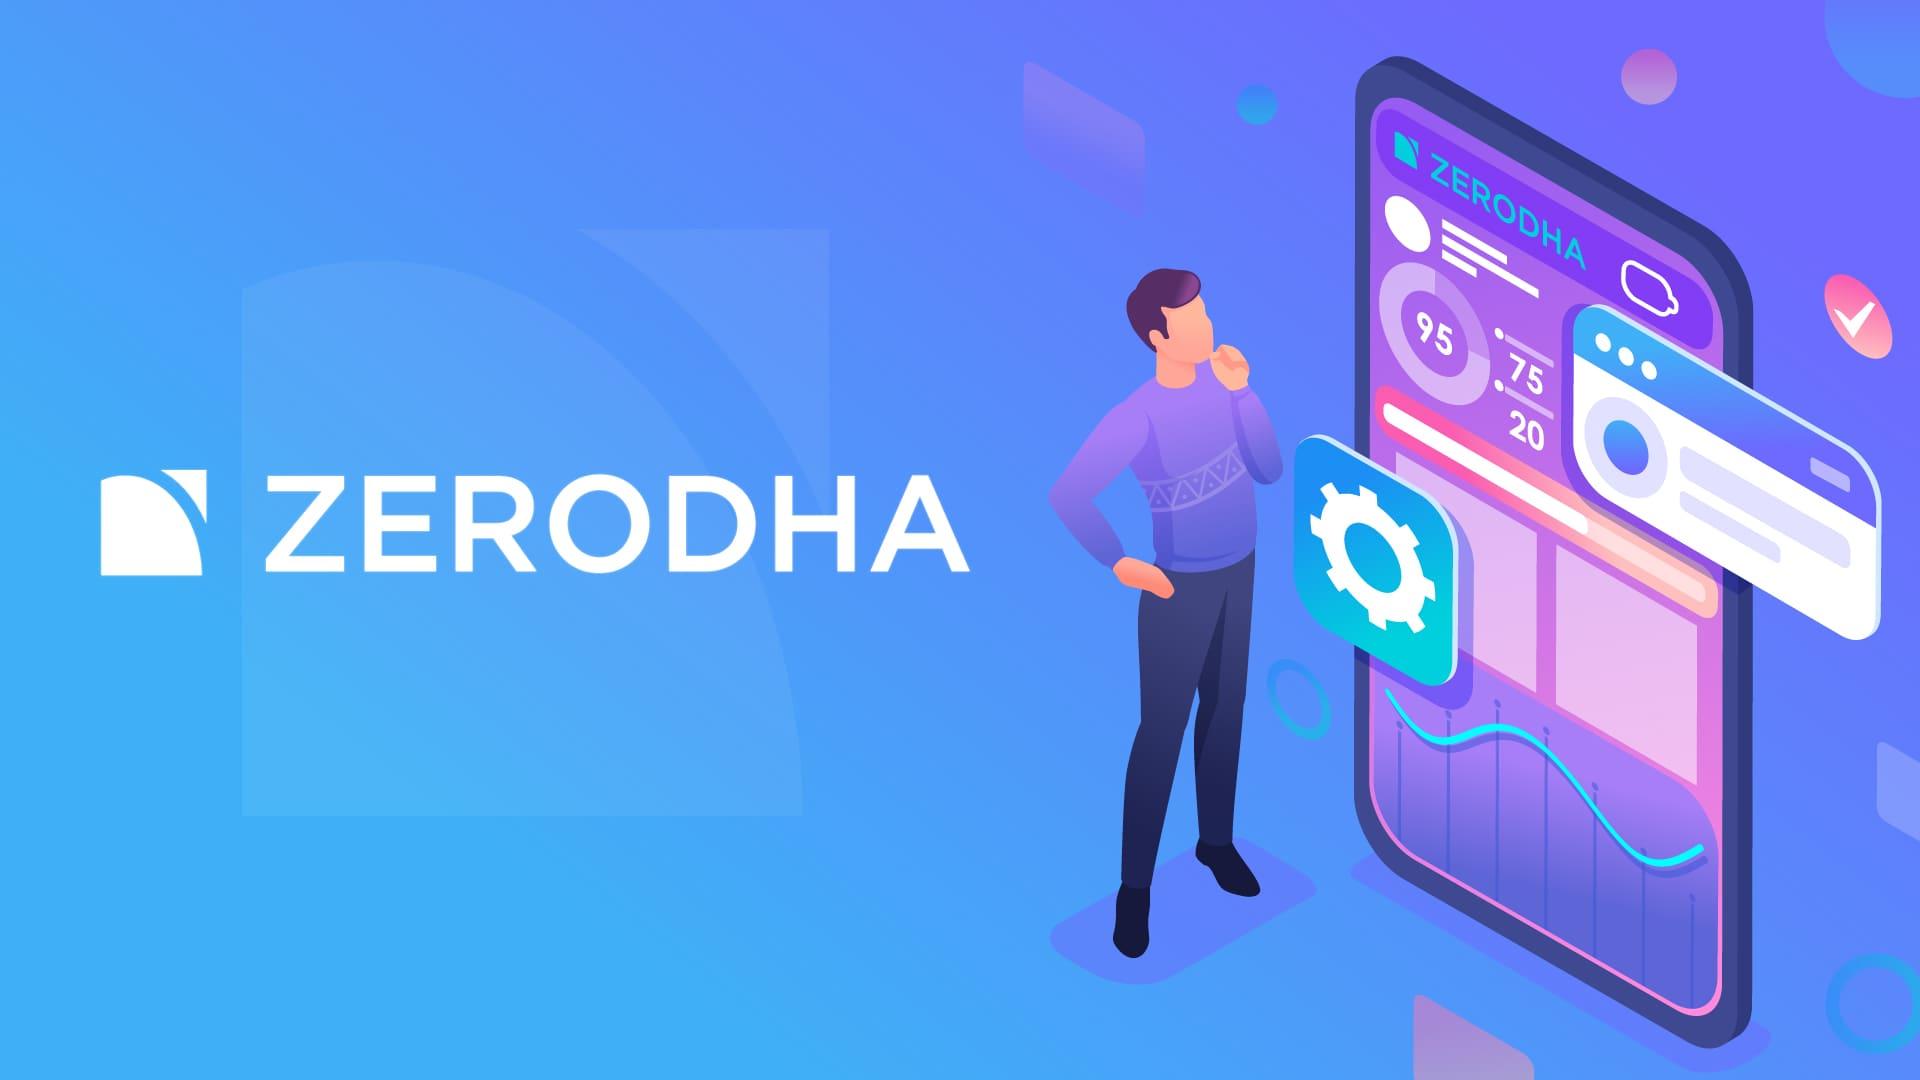 Zerodha Users Experienced Charting Data Issues